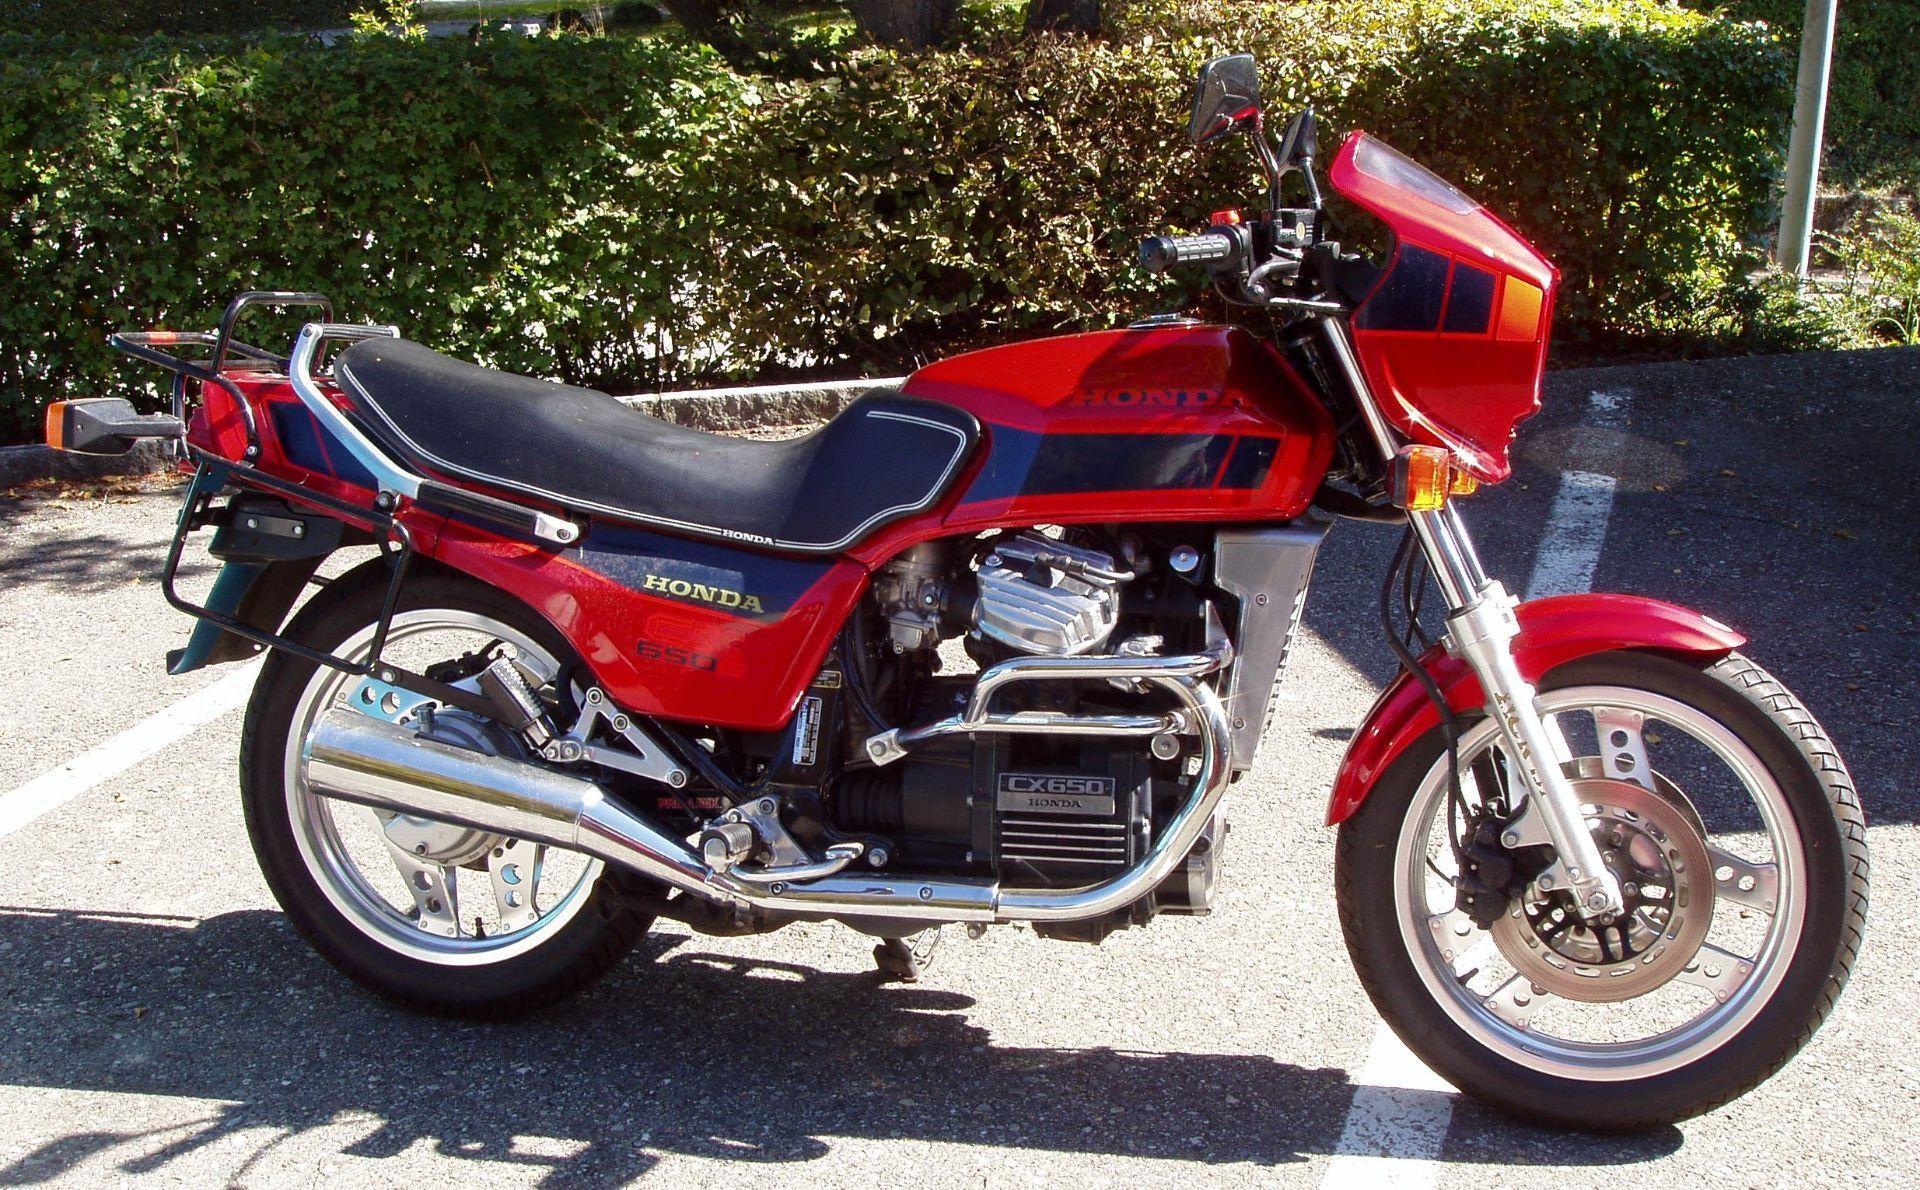 motorrad bapst motos ag kaufen ducati cx 650 e 1198. Black Bedroom Furniture Sets. Home Design Ideas